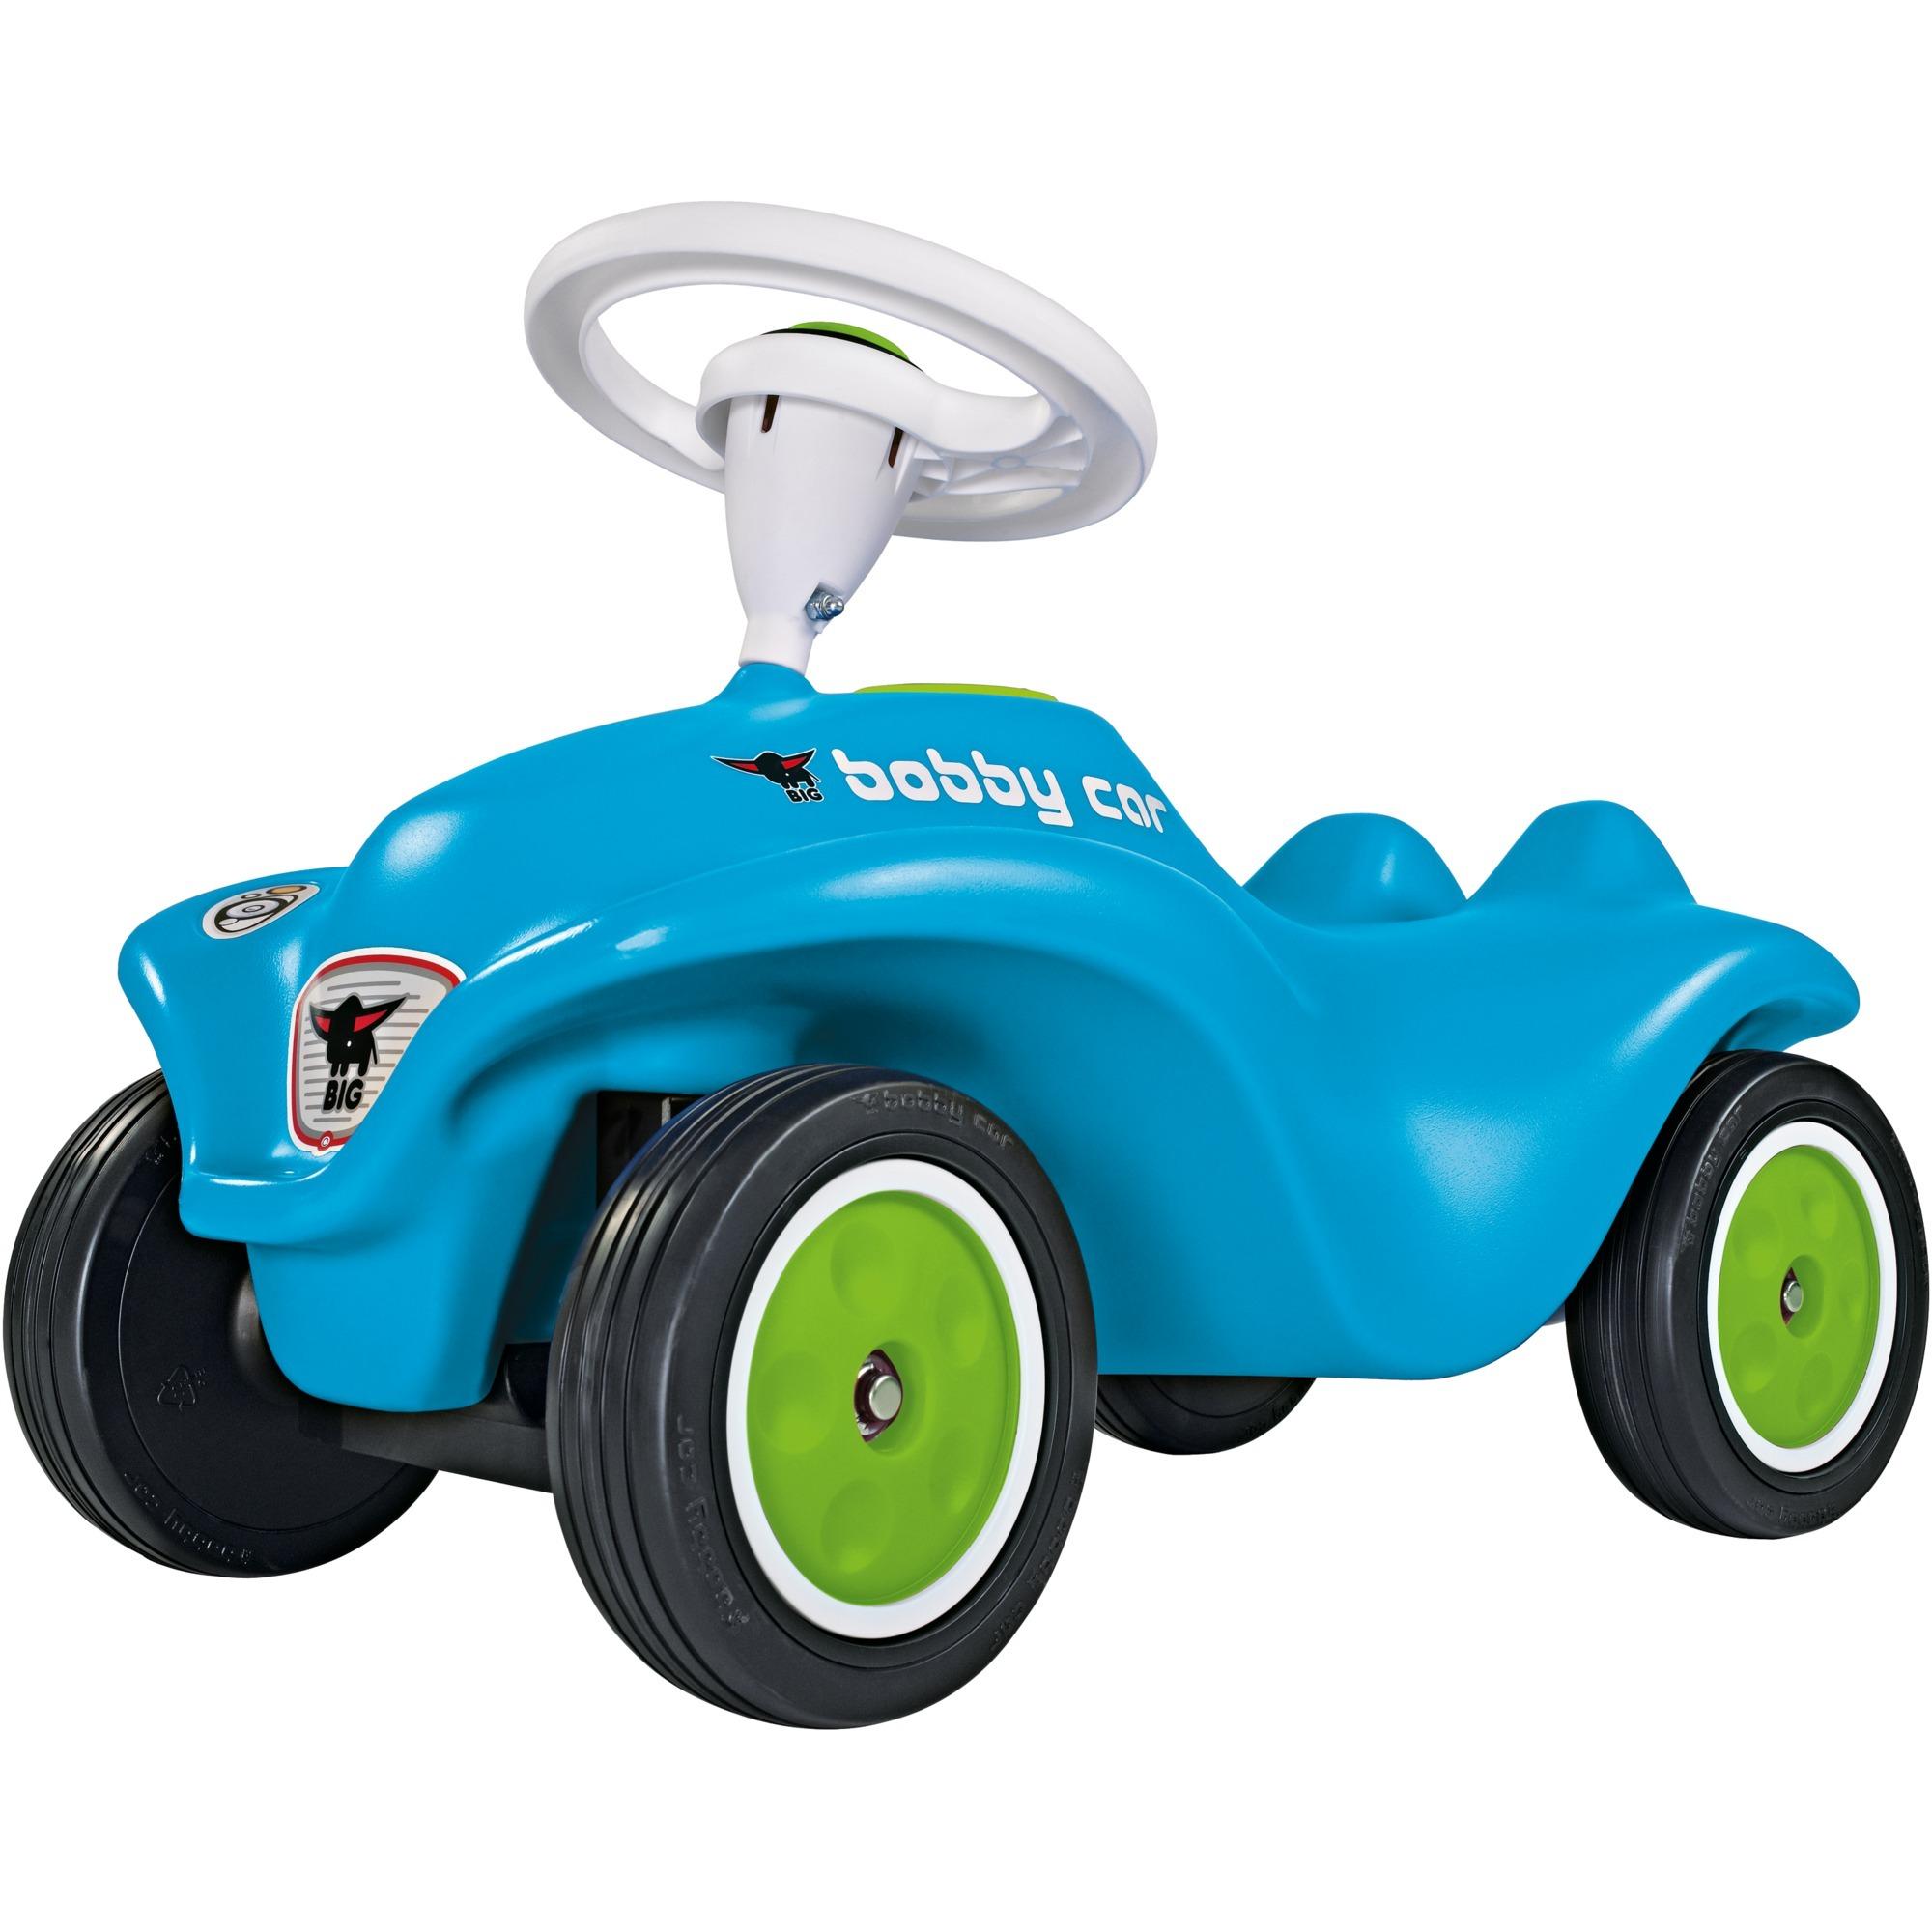 new-bobby-car-rb-3-bu-born-koretoj